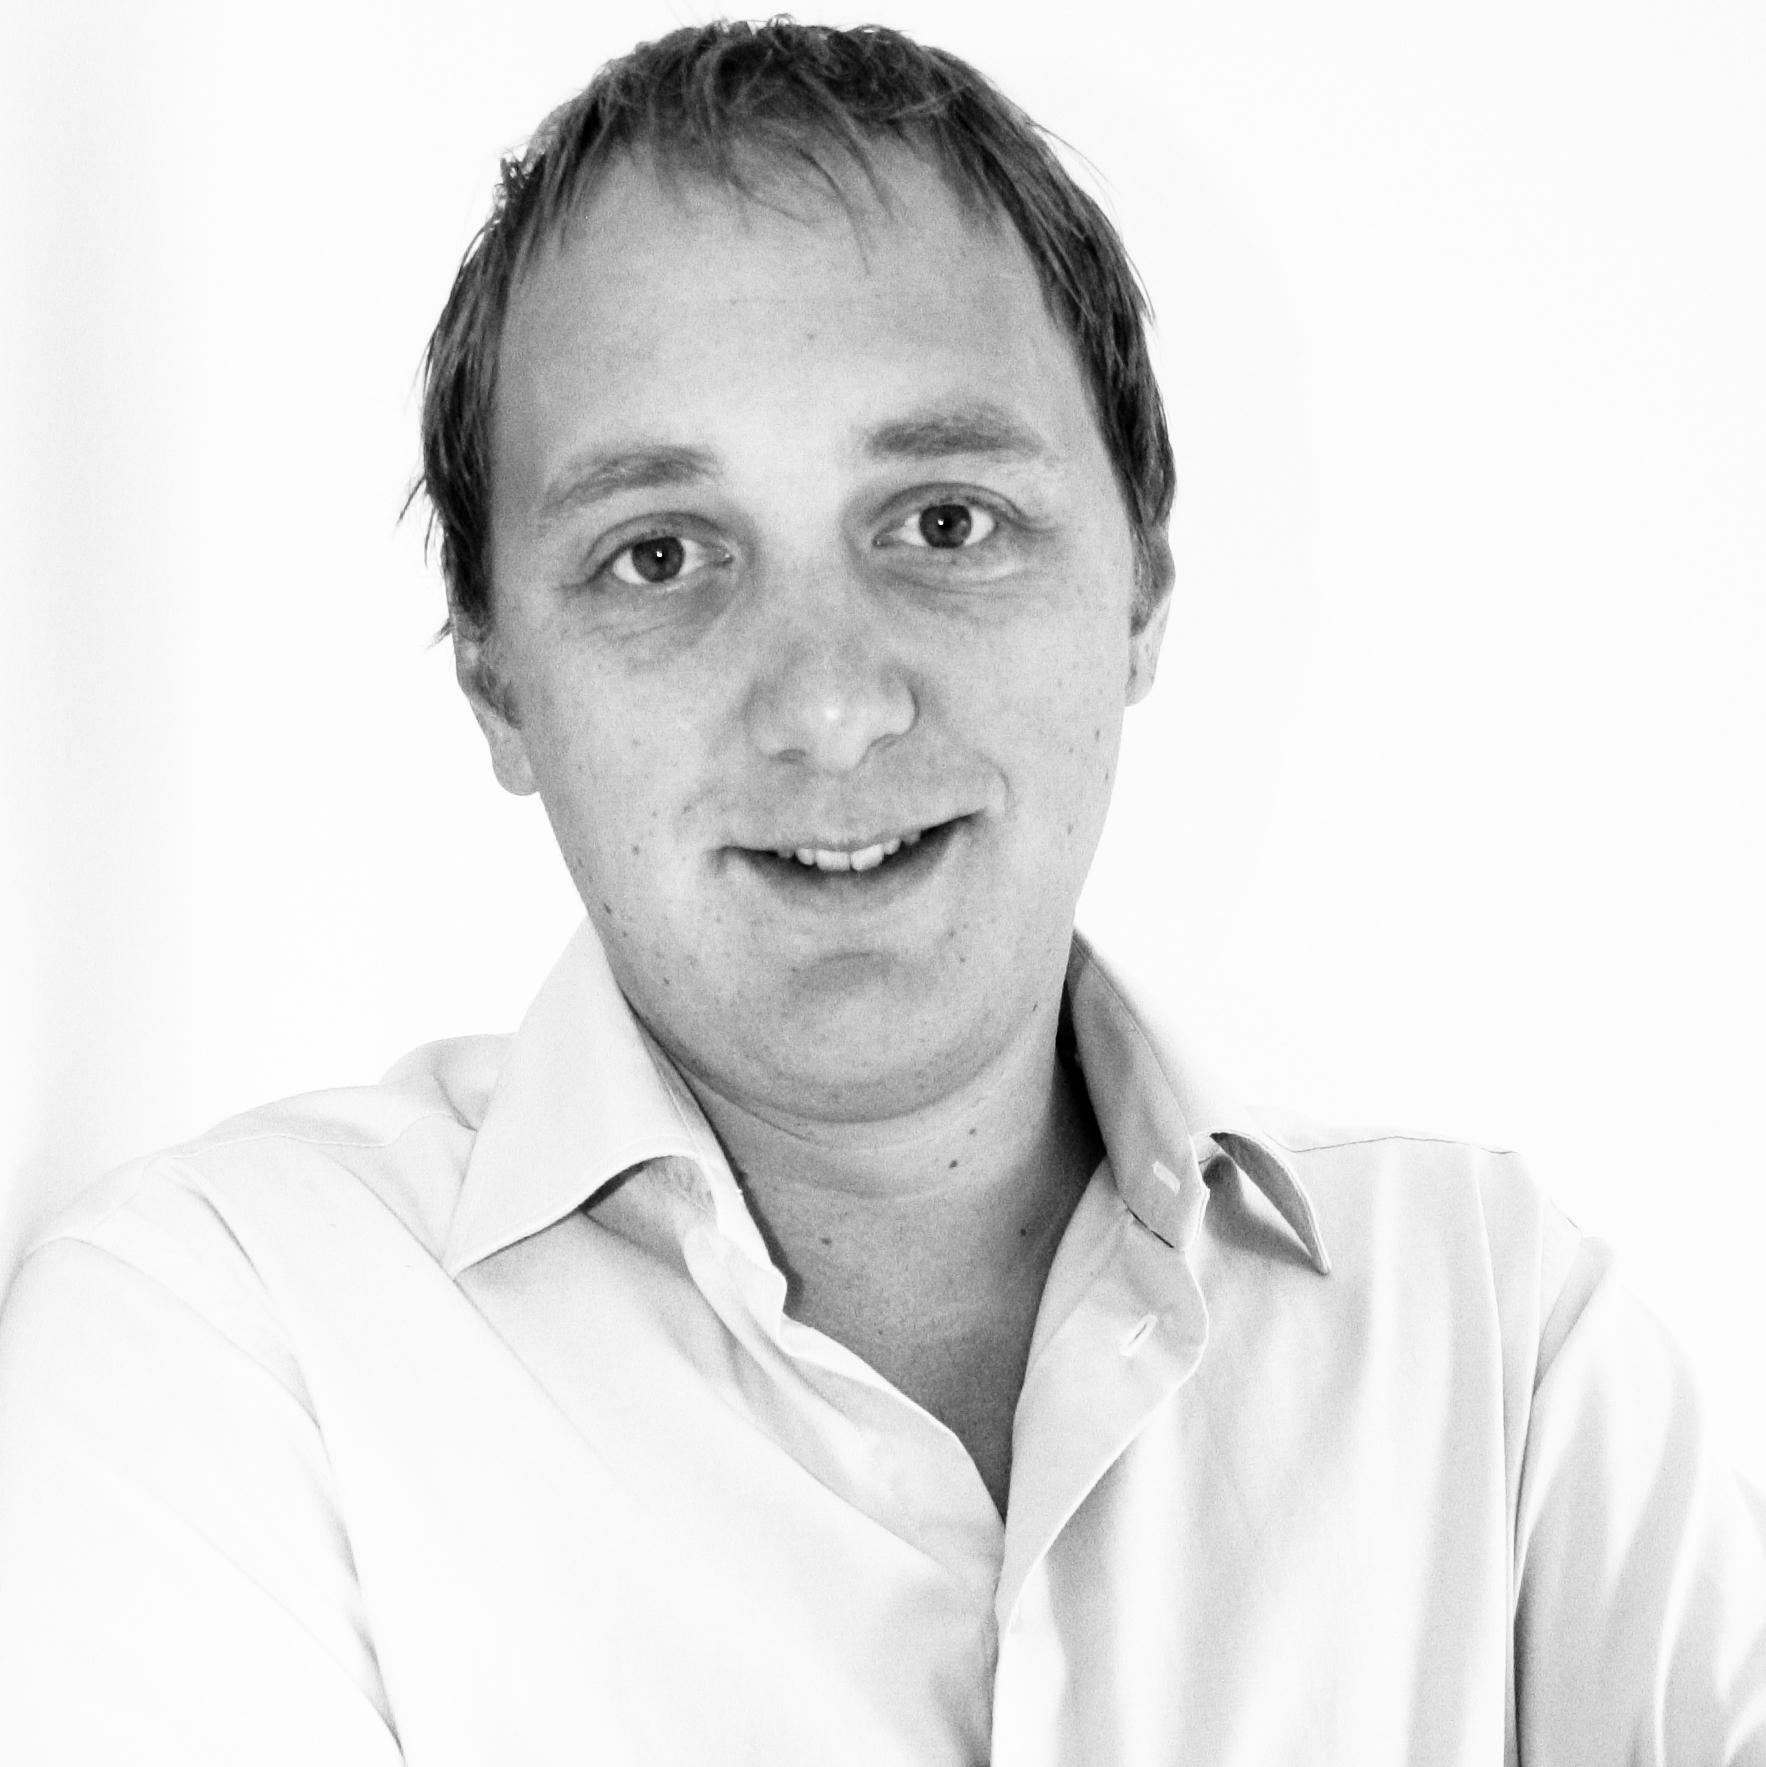 Giles Packham